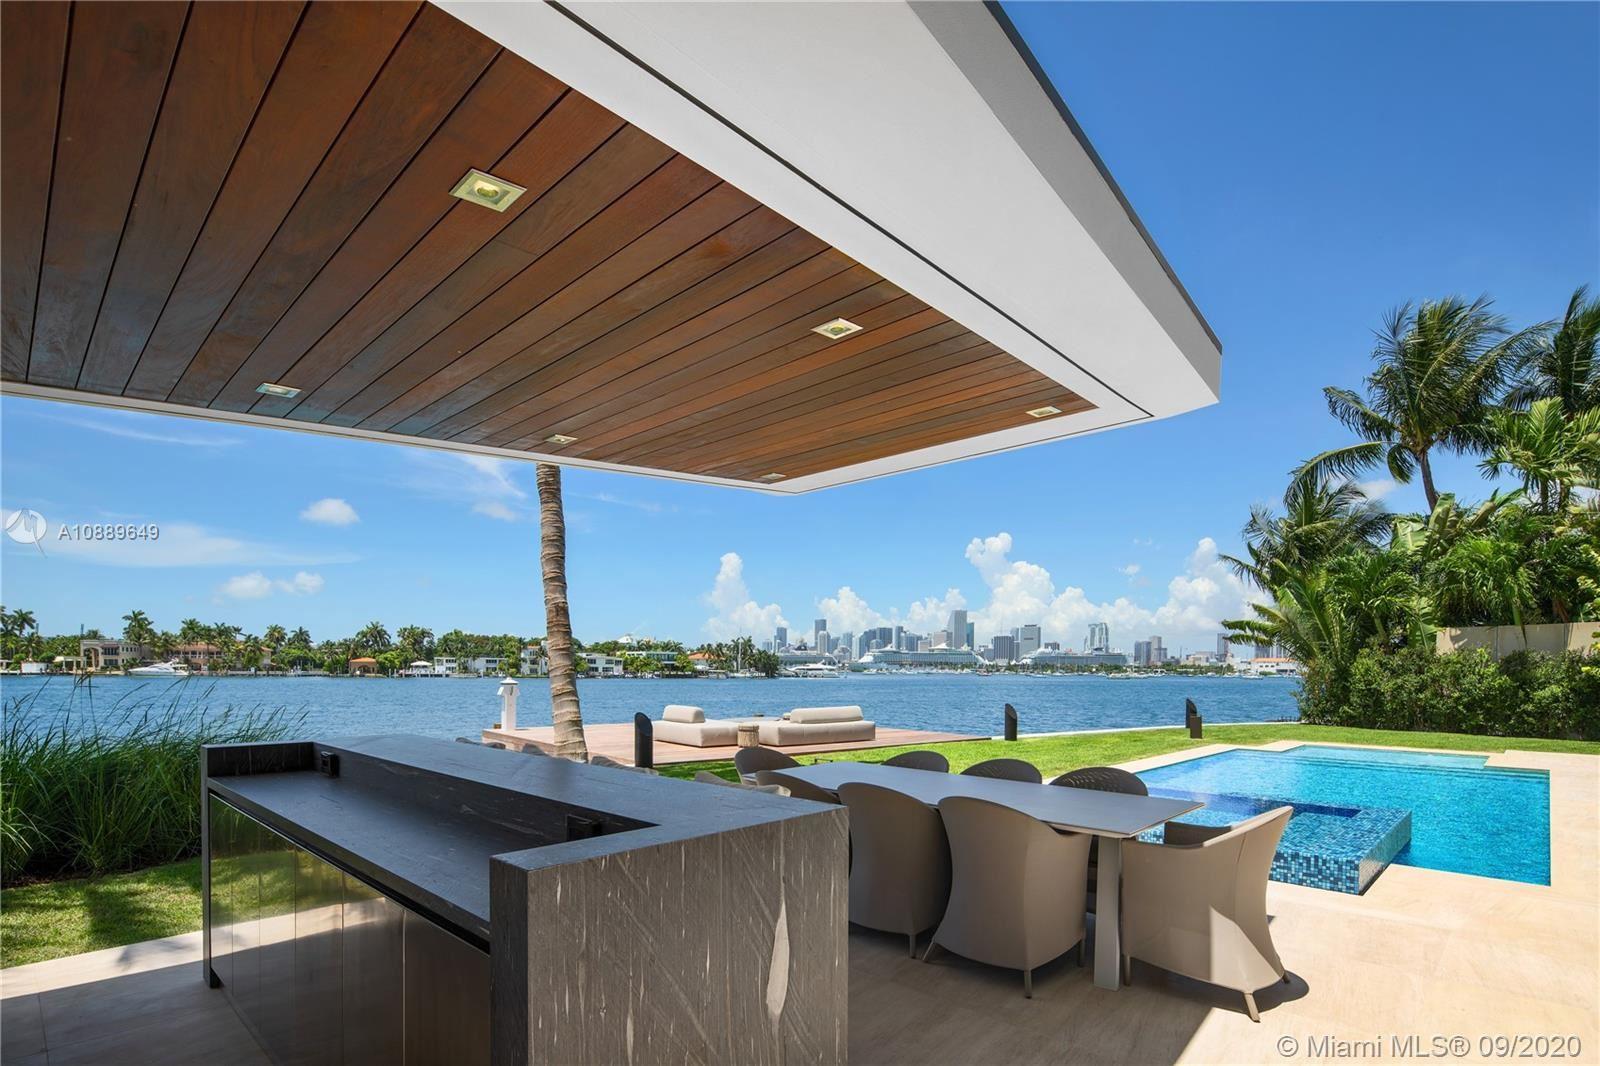 Photo 5 of Listing MLS a10889649 in 10 W San Marino Dr Miami Beach FL 33139